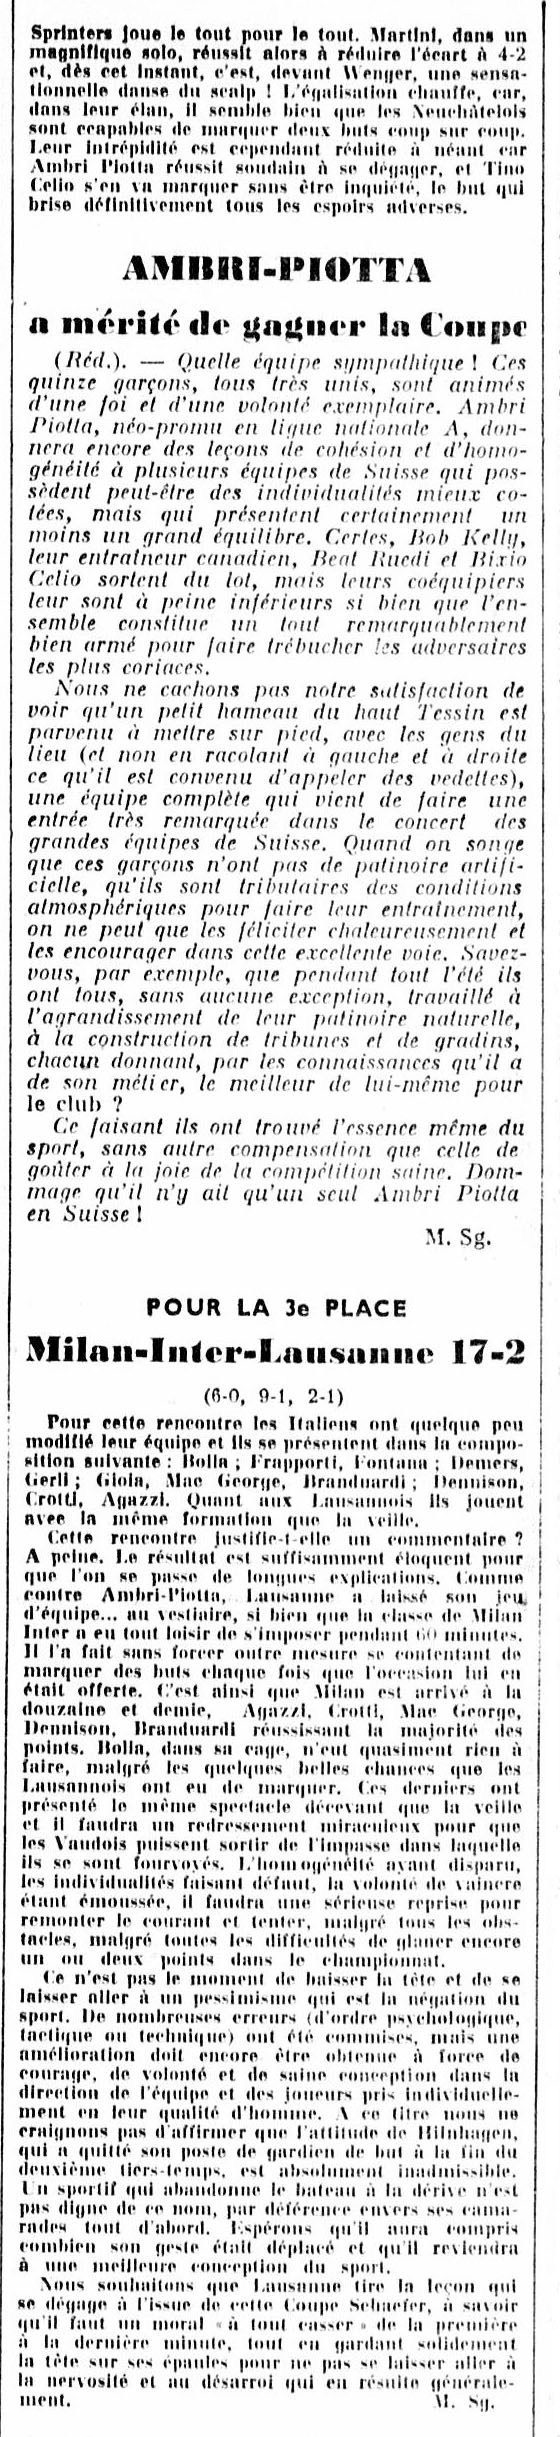 Le Matin - Tribune de Lausanne_19531214_aeun3j-2.jpg